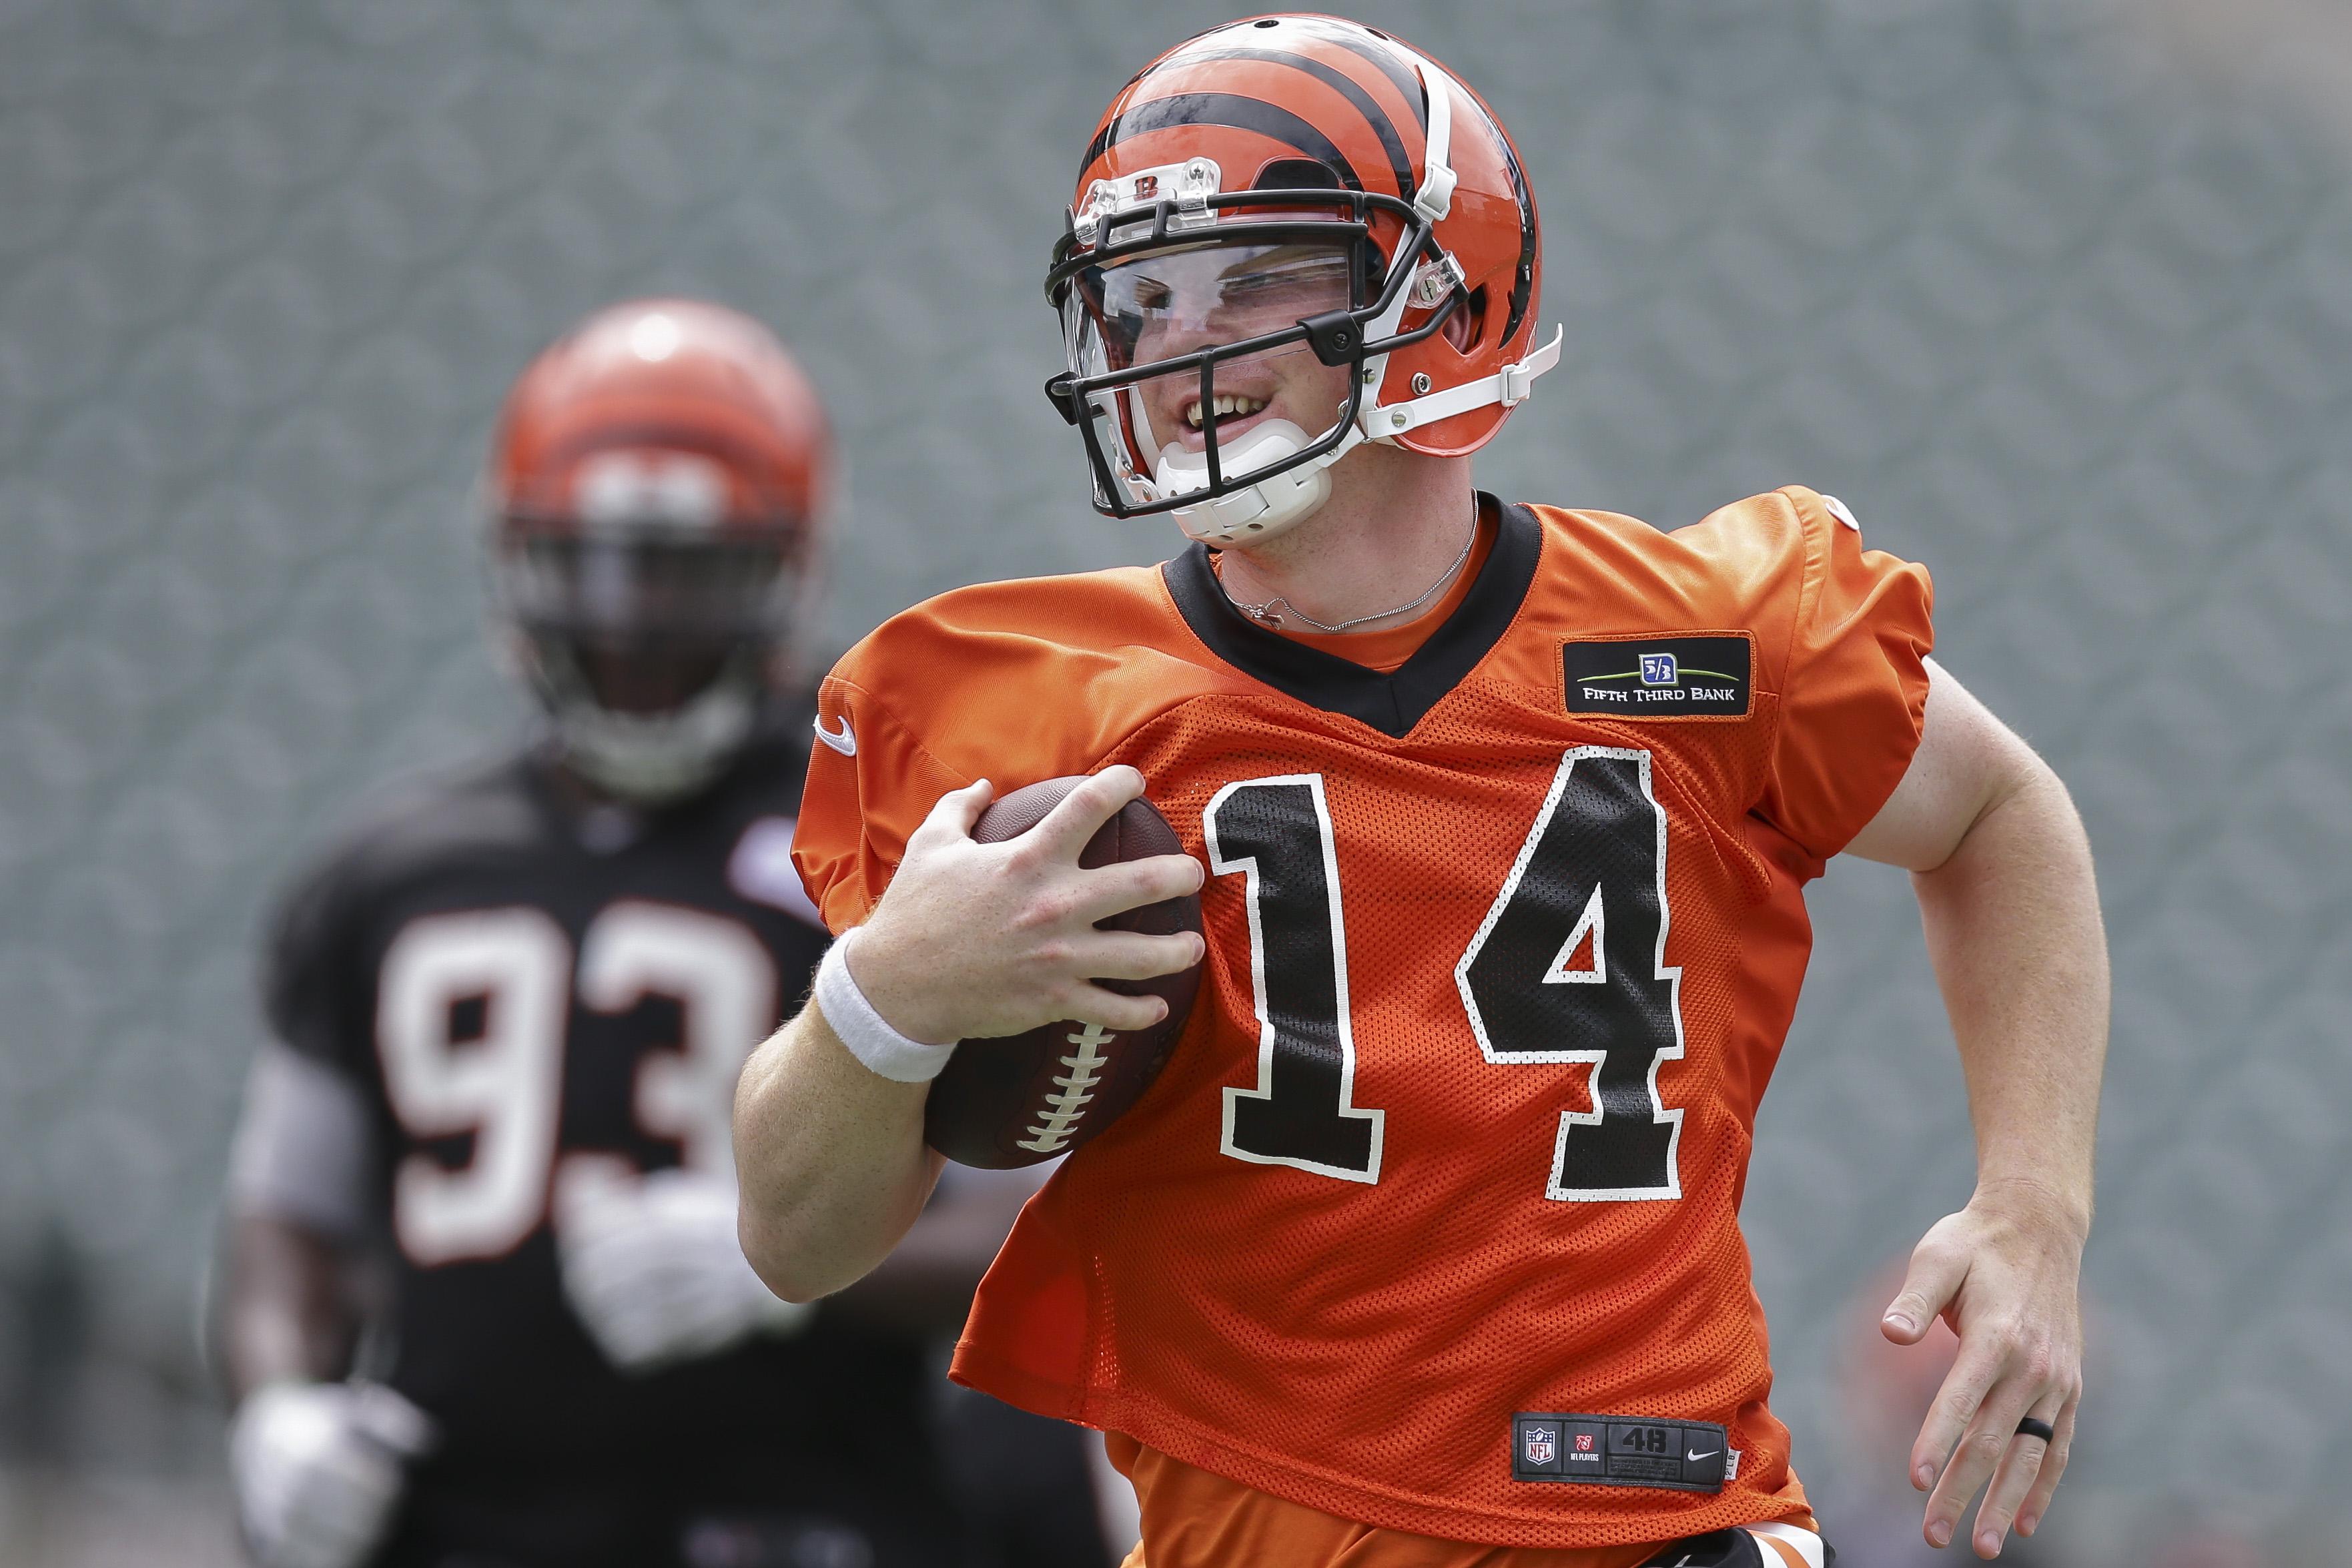 Cincinnati Bengals quarterback Andy Dalton runs a drill during an NFL football minicamp at Paul Brown Stadium in Cincinnati, Wednesday, June 17, 2015. (AP Photo/John Minchillo)